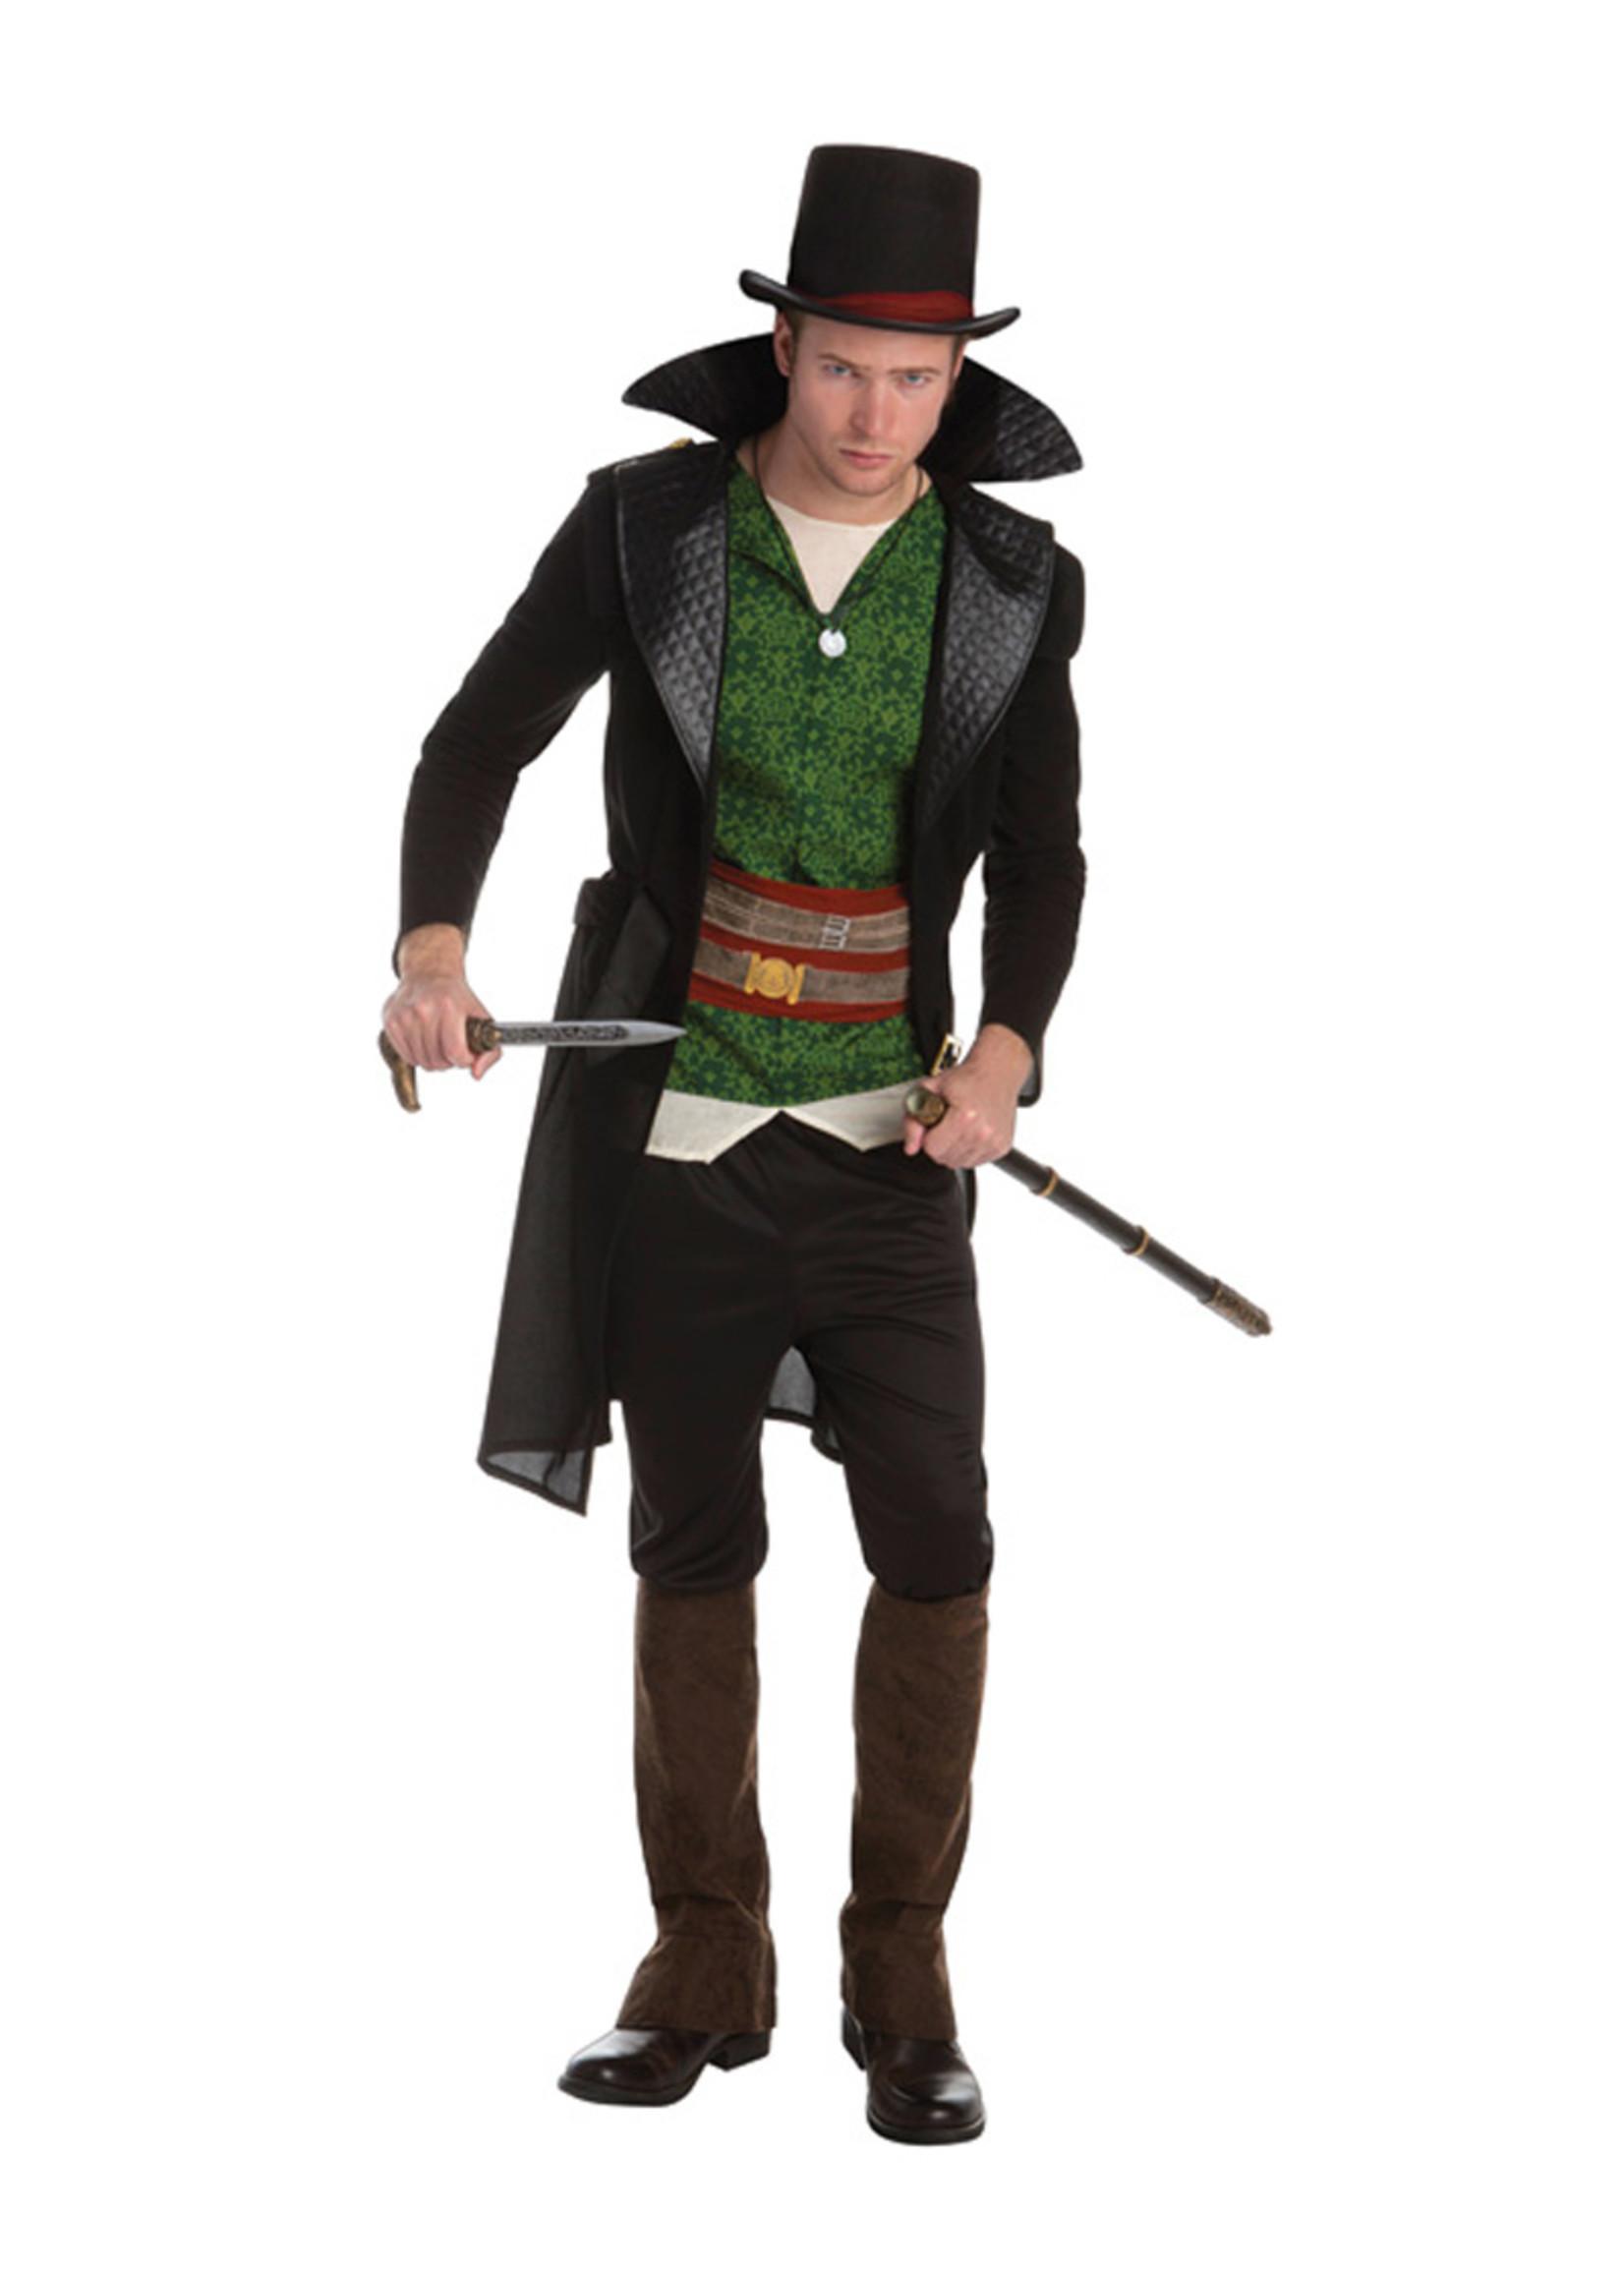 Jacob Frye - Assassin's Creed Costume - Men's